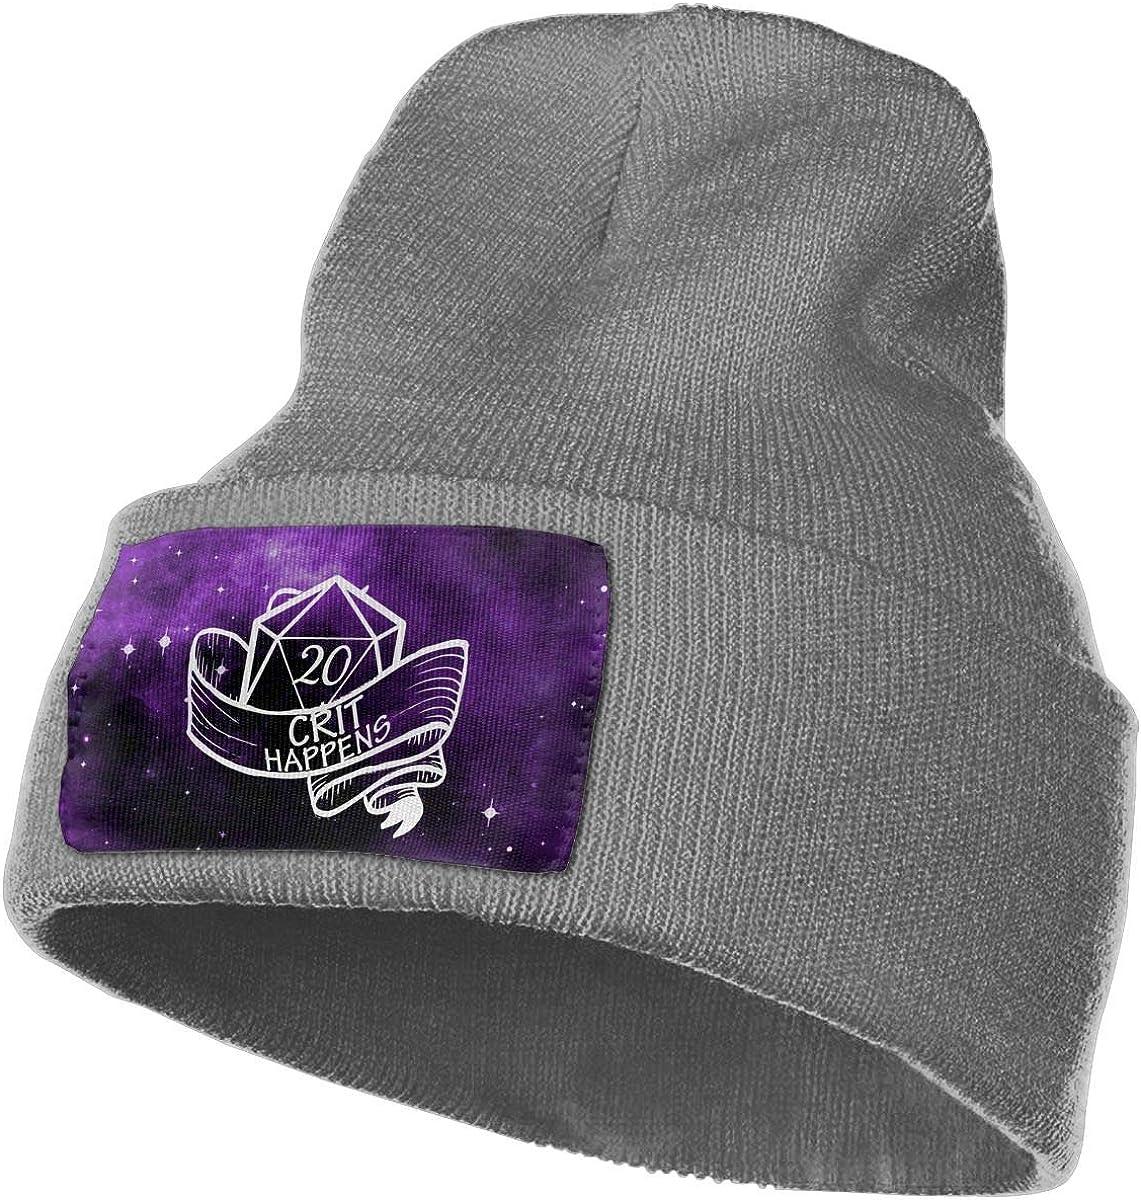 Helidoud Crit Happens Winter Beanie Hat Knit Hat Cap for for Men /& Women